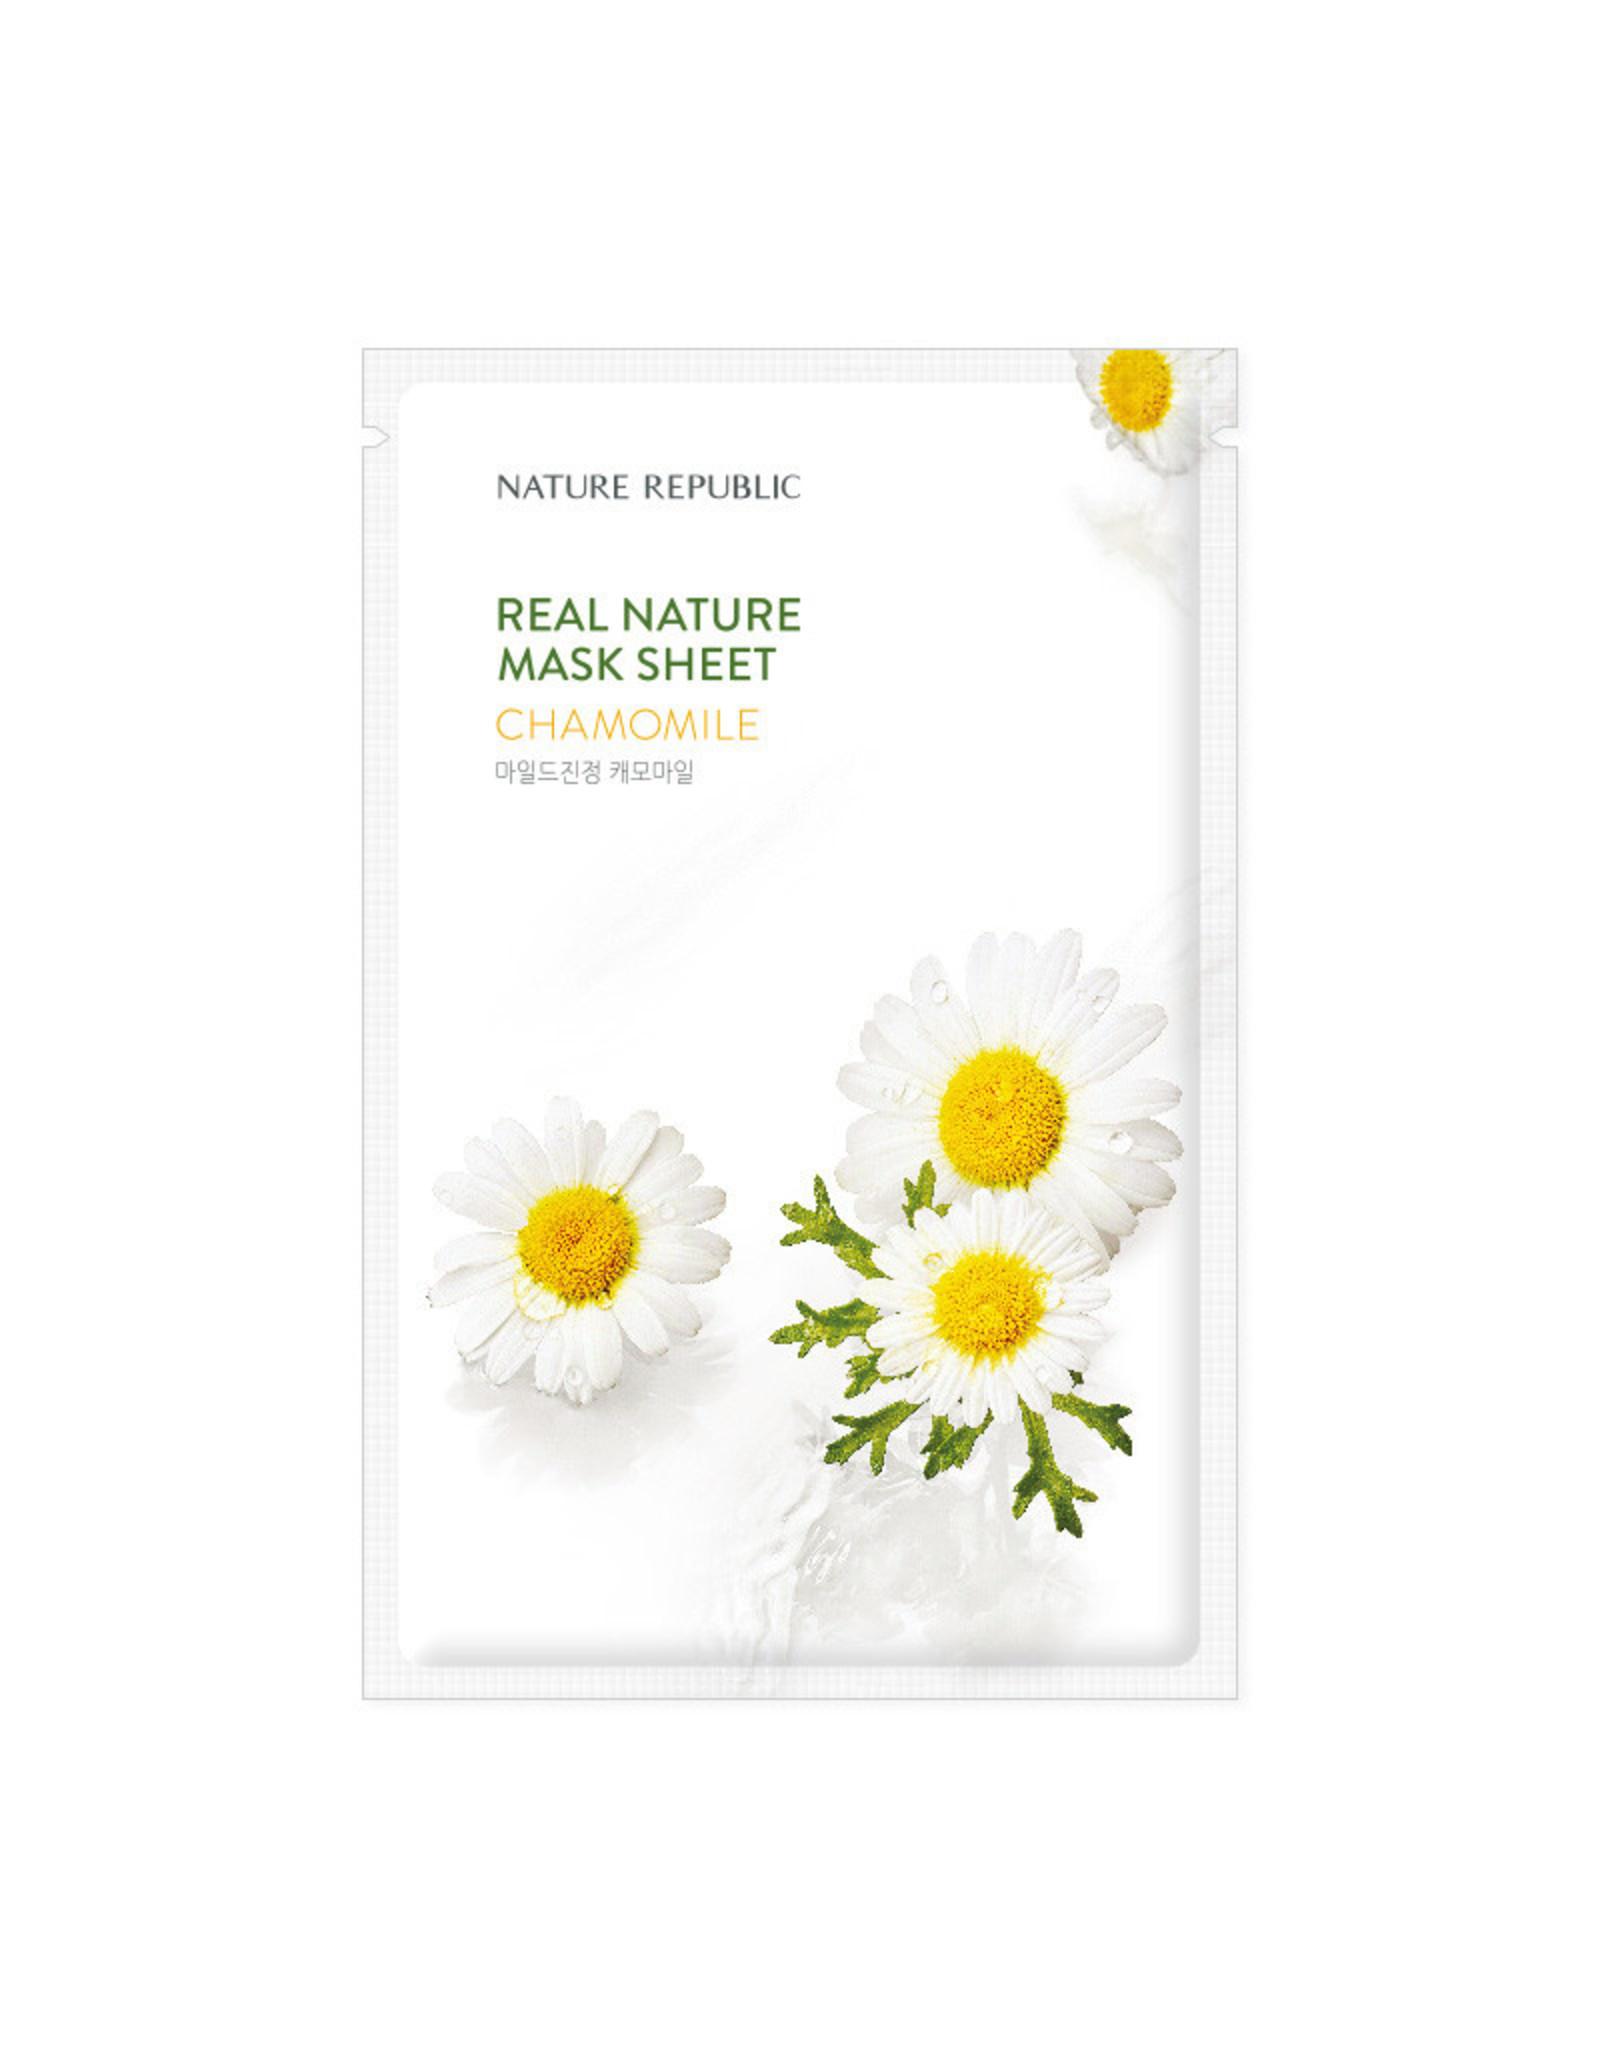 Real Nature Chamomile Mask Sheet (Orig $1.90)